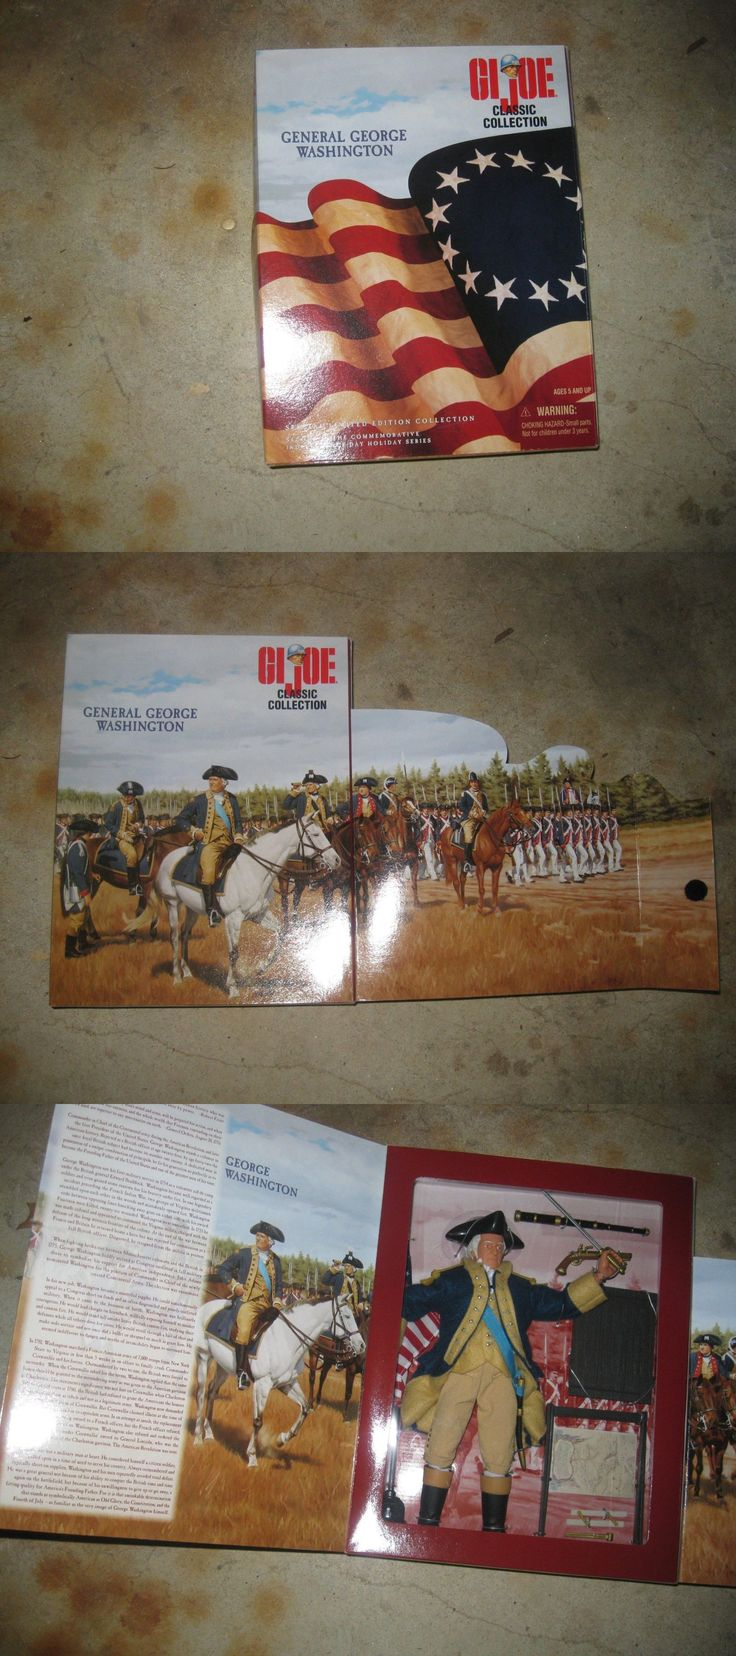 Historical Figures 175694: George Washington Gi Joe Action Figure Mib -> BUY IT NOW ONLY: $70 on eBay!